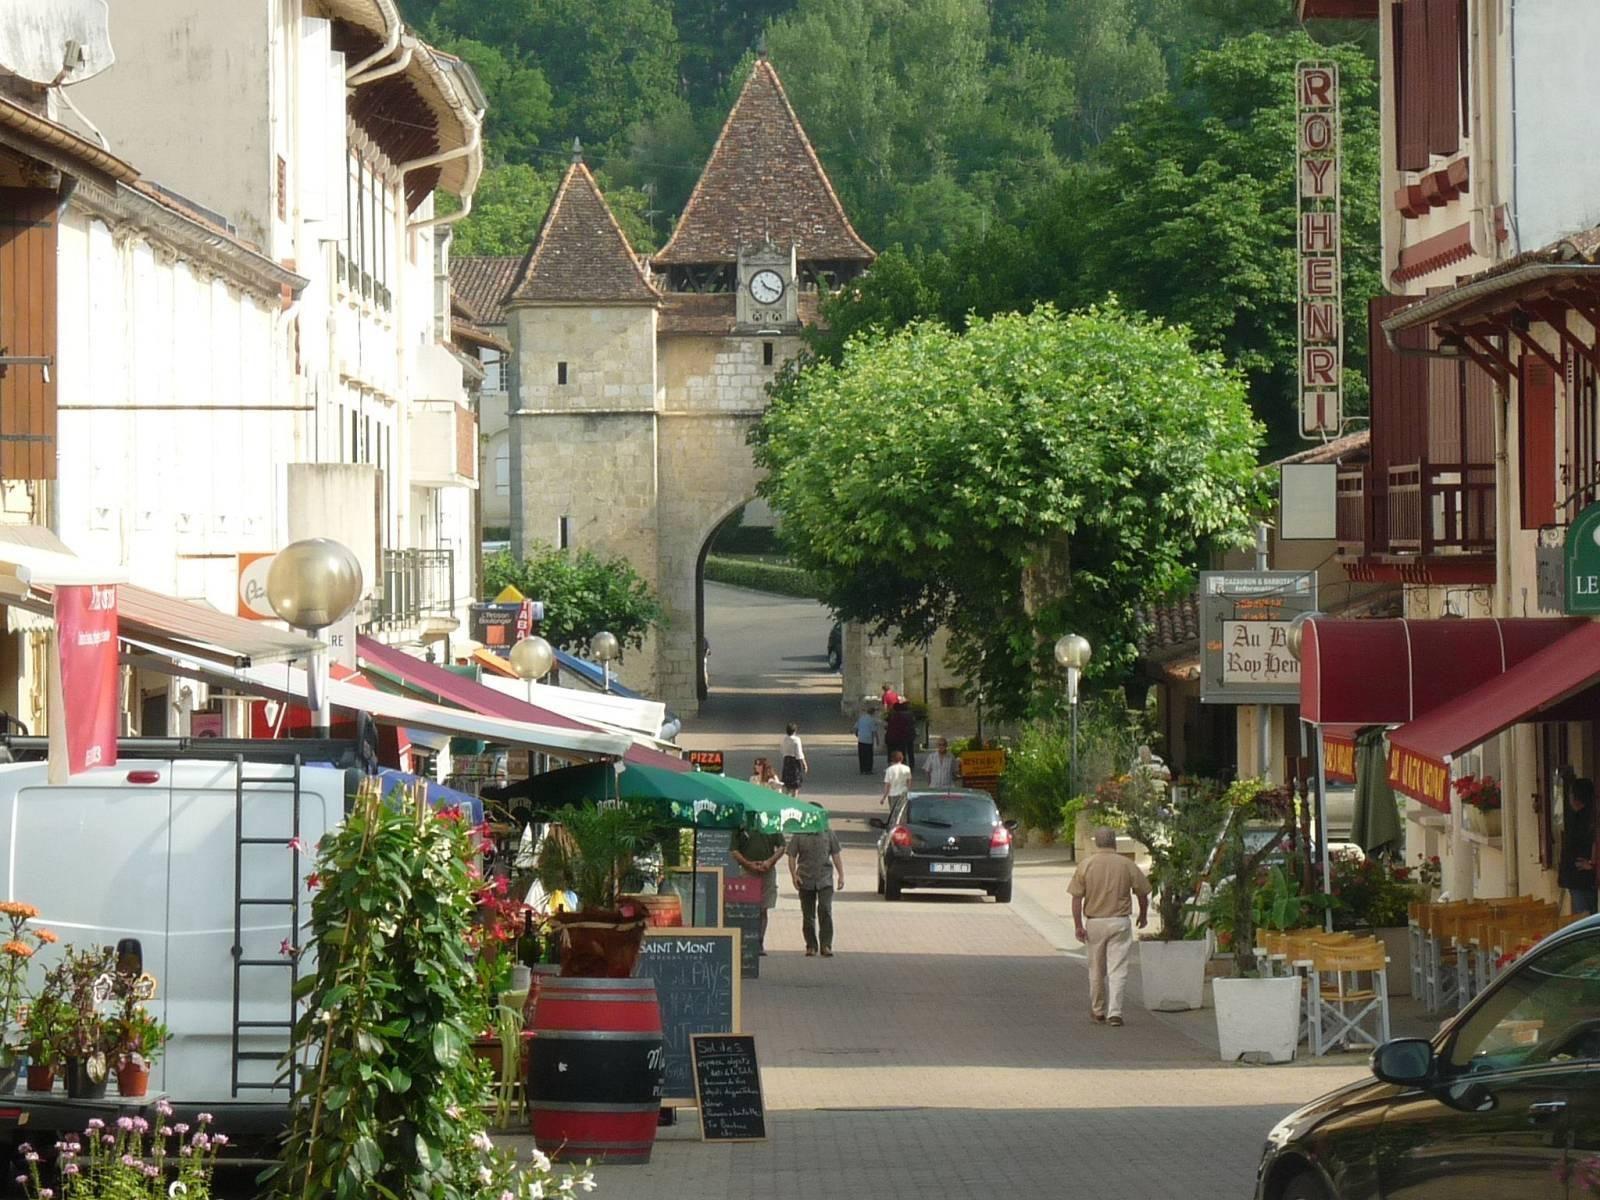 Barbotan-les-thermes_Cazaubon